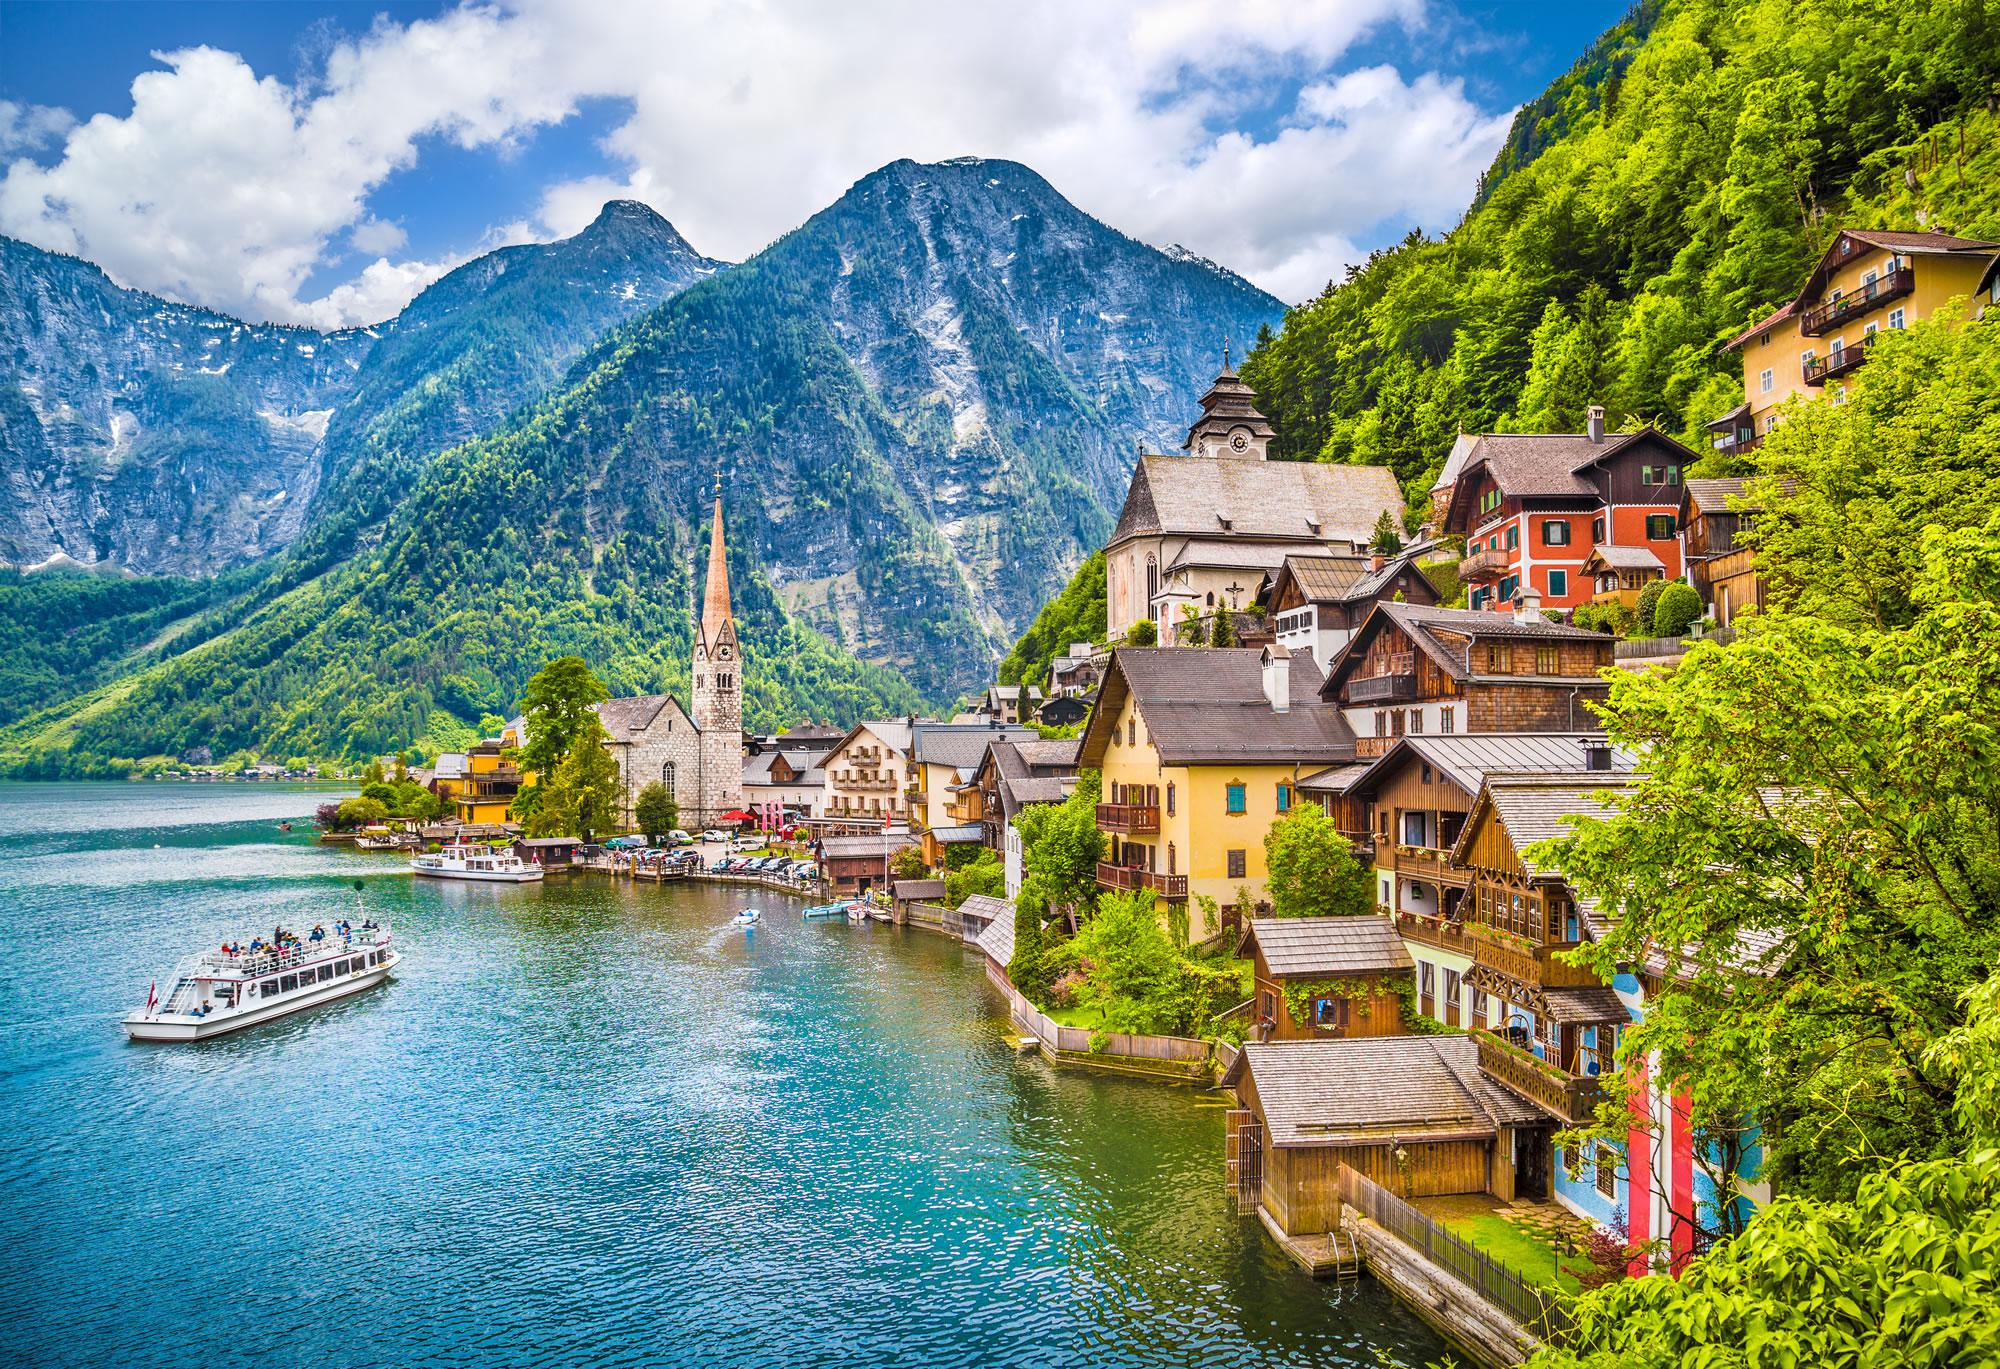 Hallstaetter Lake in the Austria